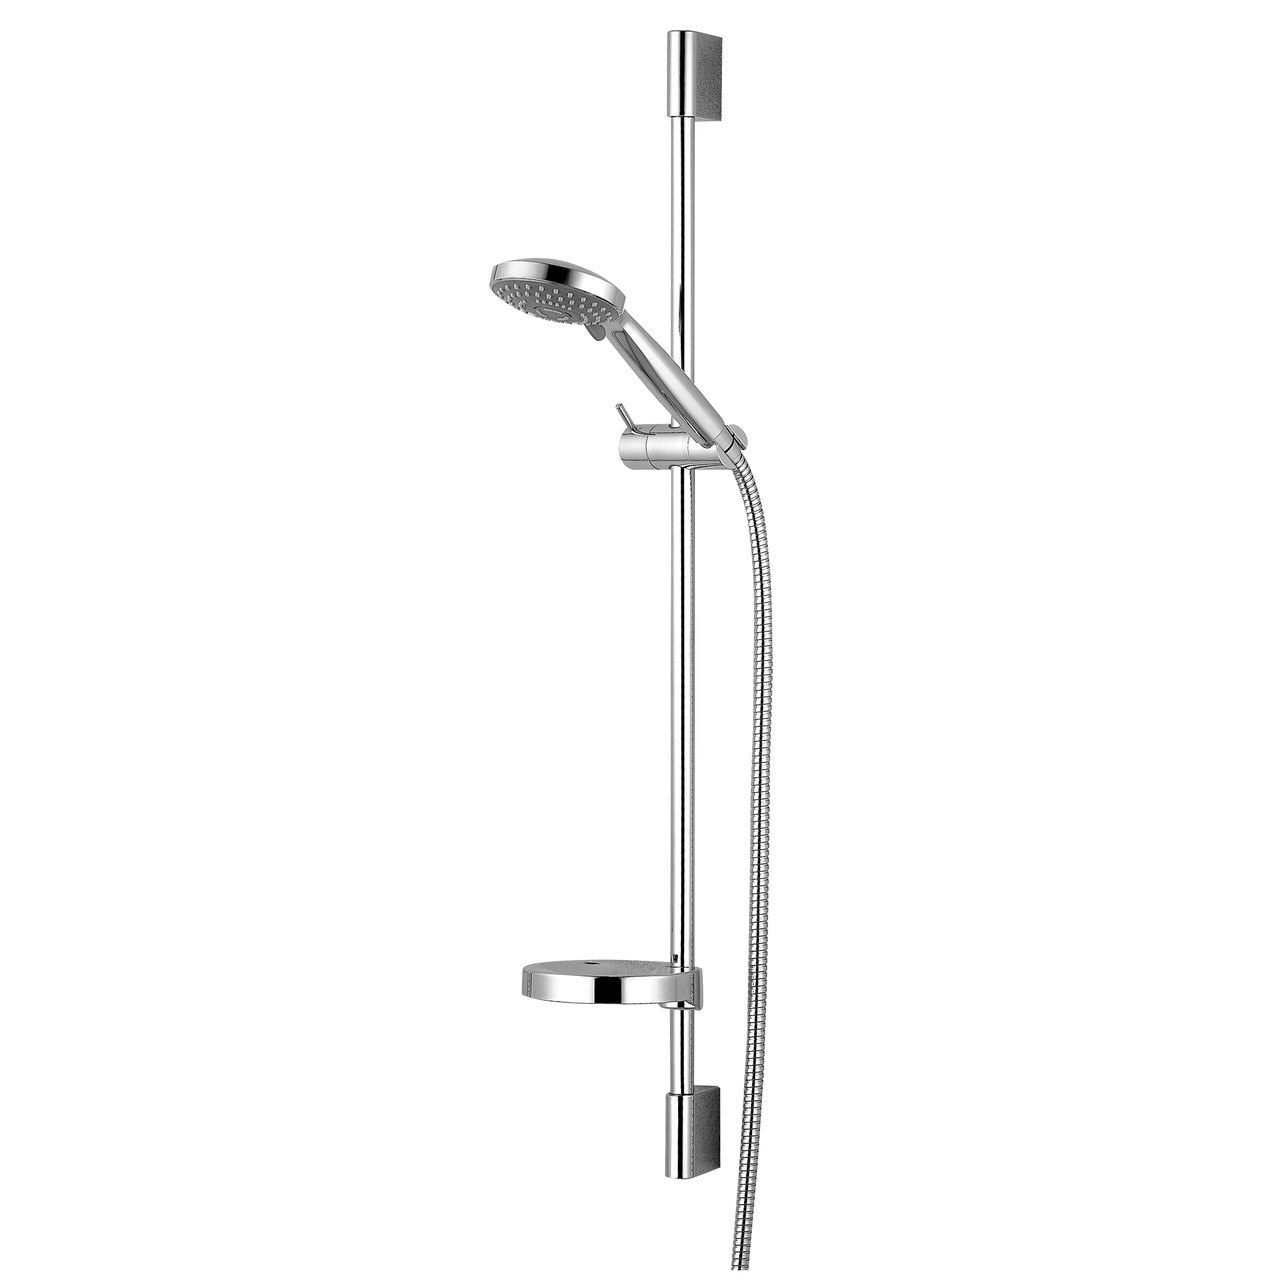 Штанга душевая DOBRANY L-82см,мыльница,ручной душ 3 режима,шланг 1,5м с вращающимся конусом (Anti-Twist)